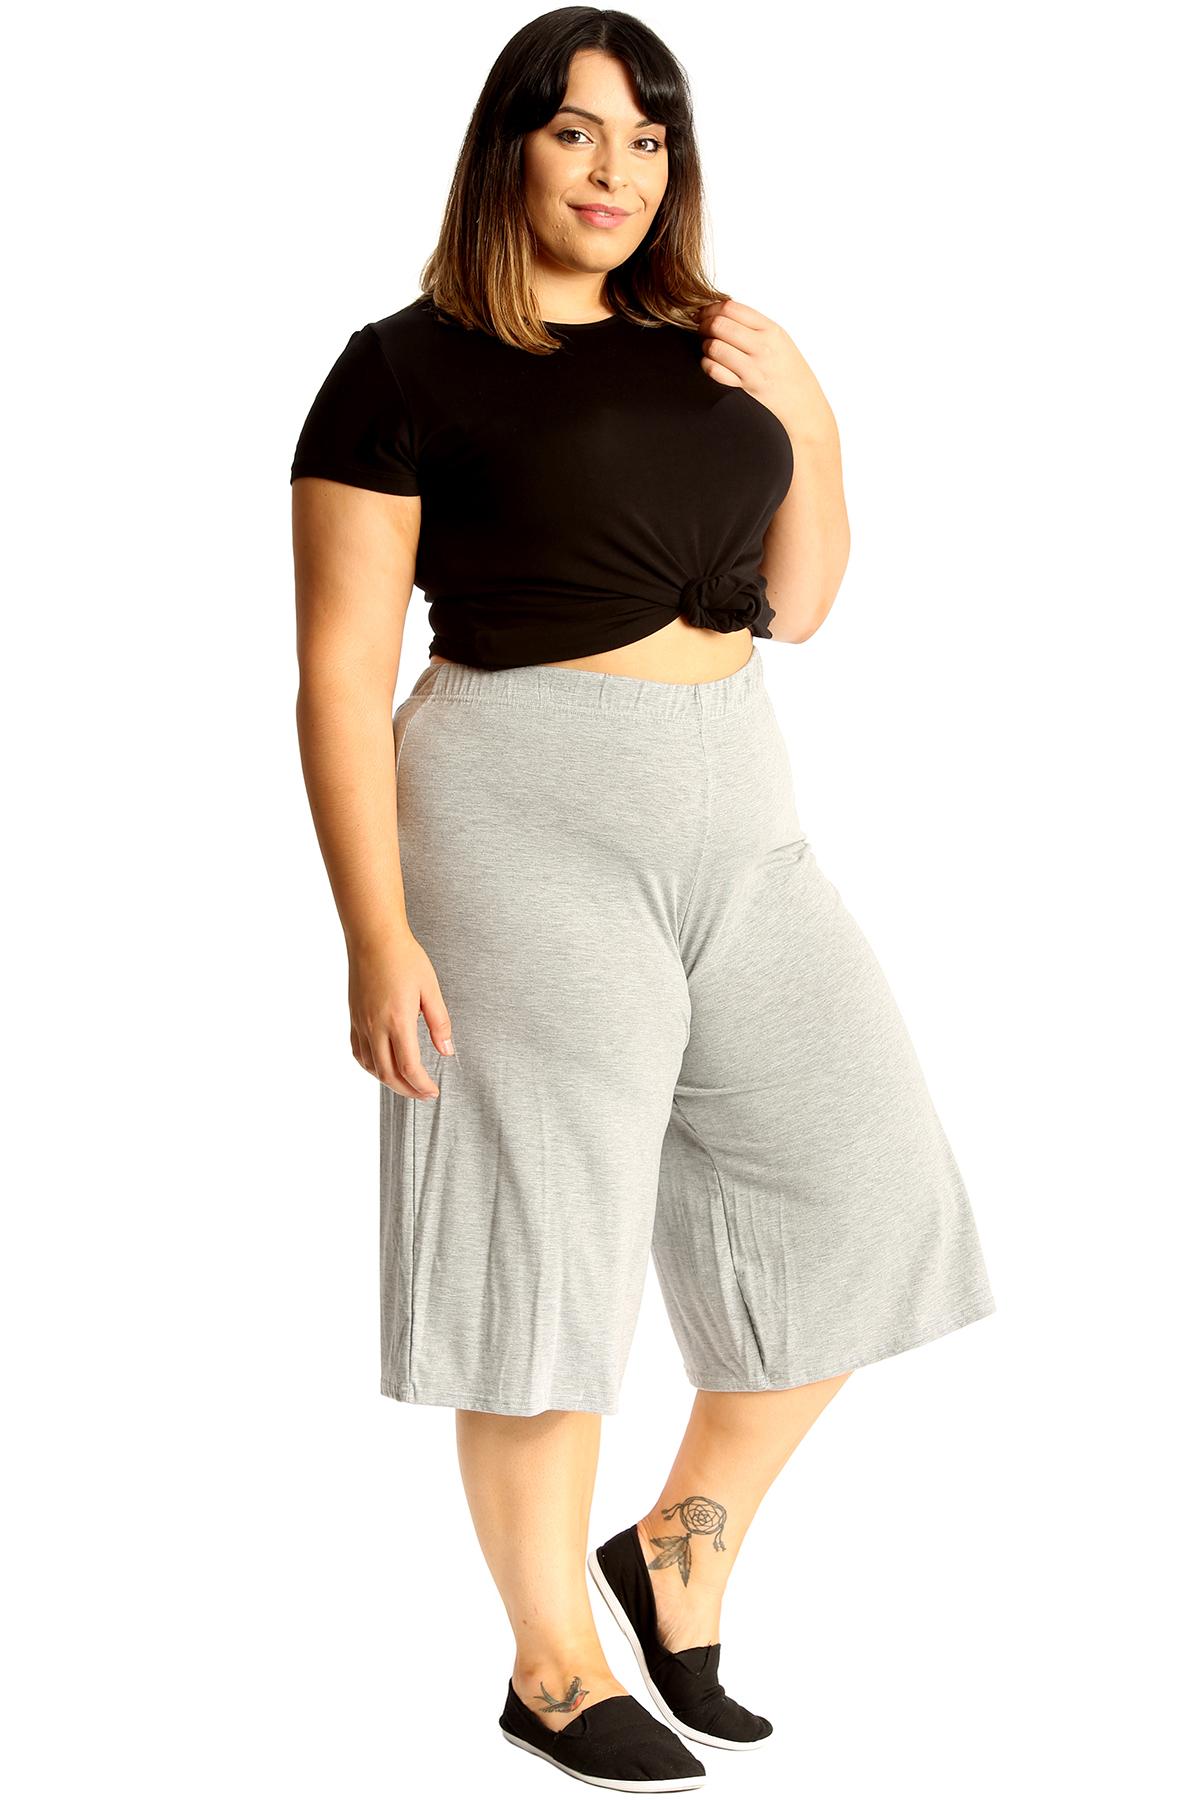 New-Womens-Plus-Size-Culottes-Ladies-Plain-Shorts-Palazzo-Elastic-Pants-Summer thumbnail 23